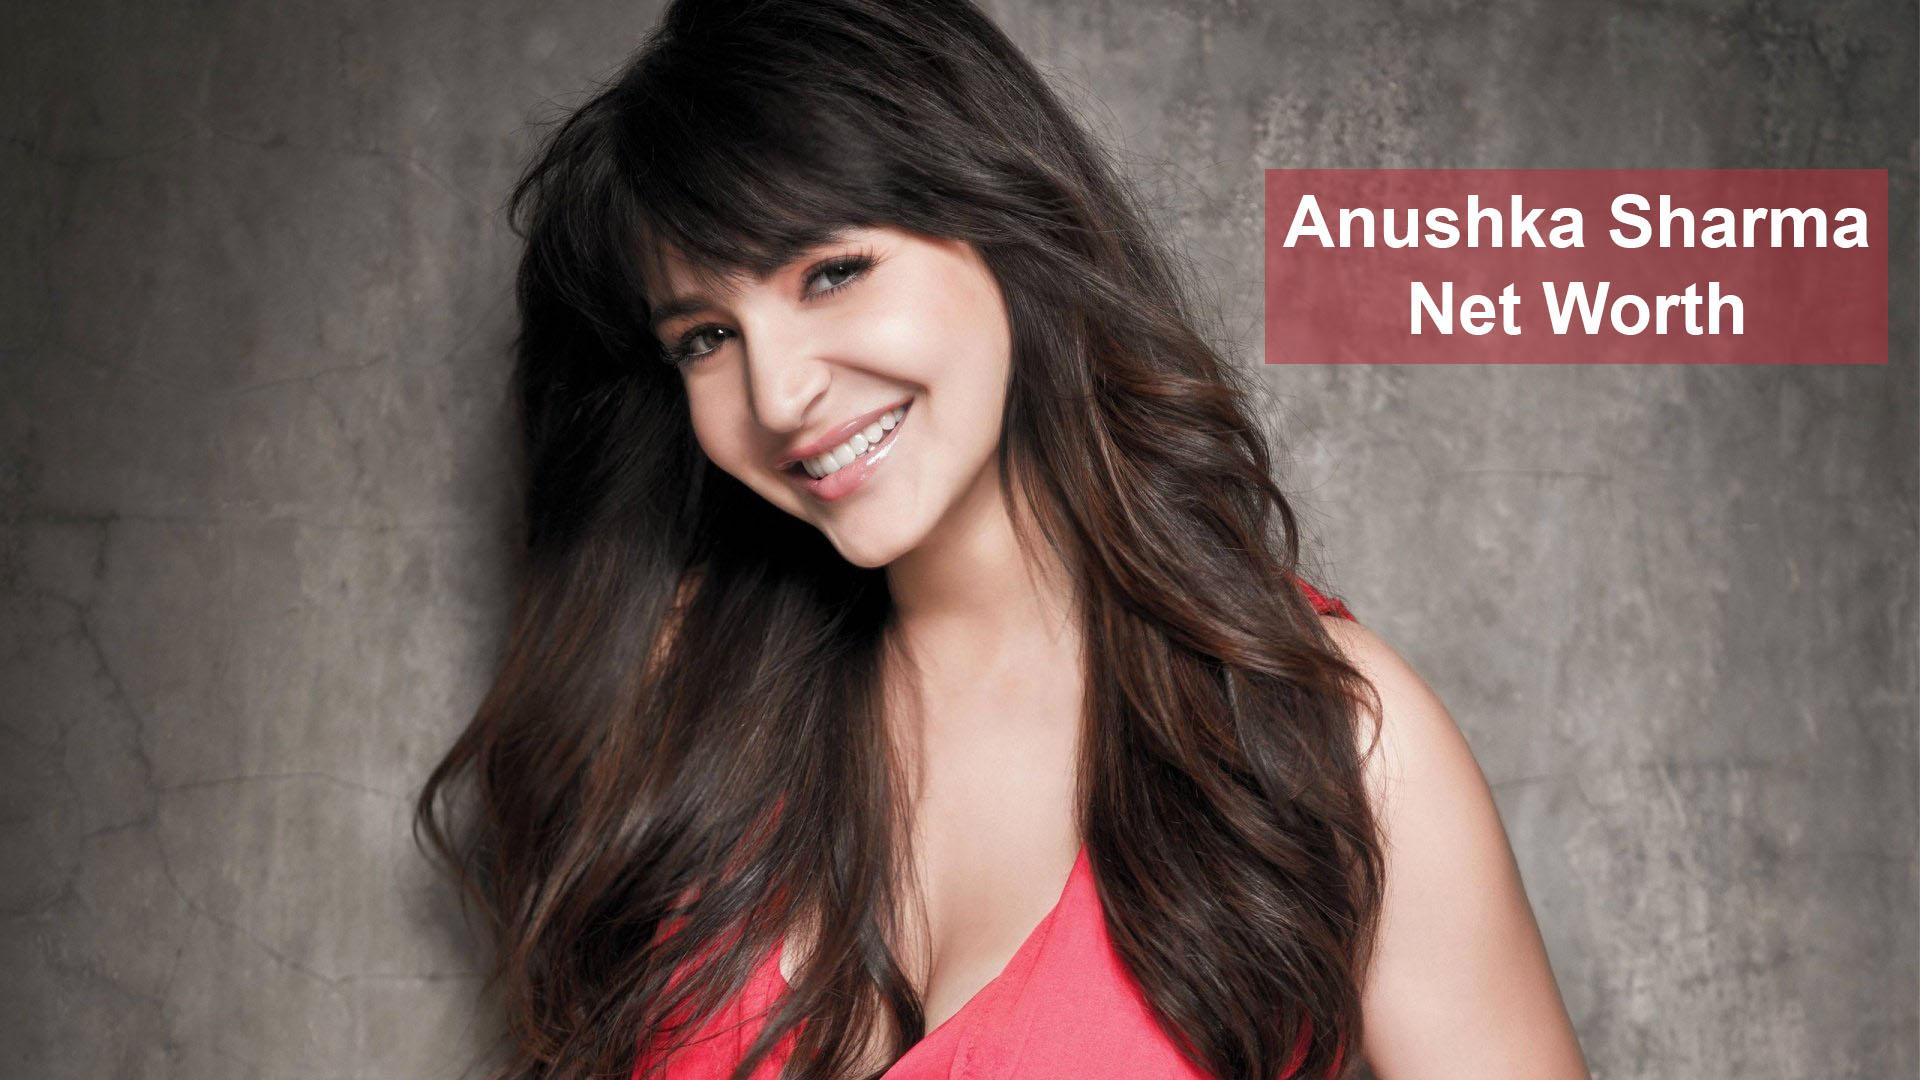 Anushka Sharma Net Worth